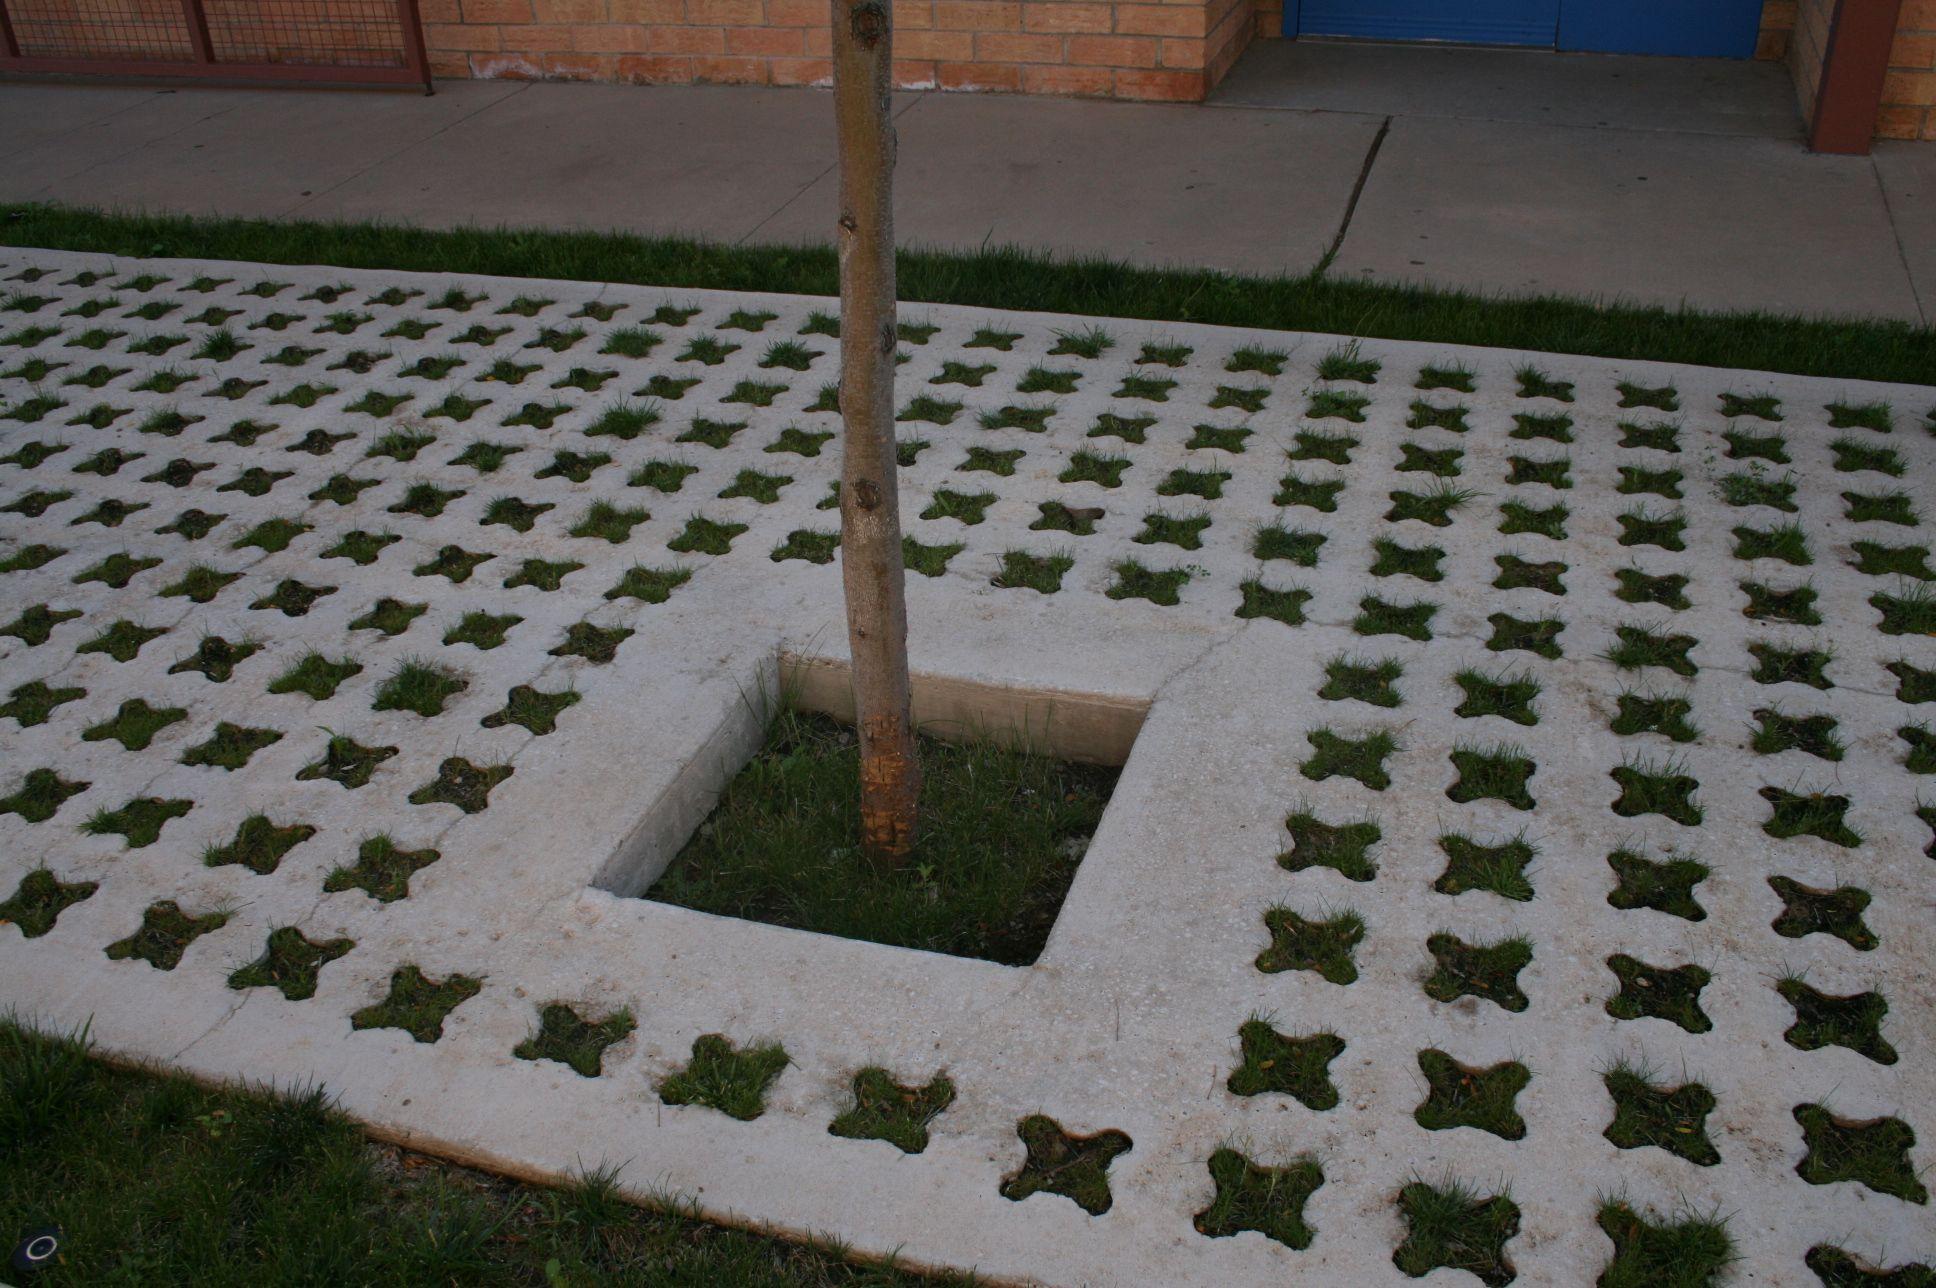 Grasscrete - St. Mikes School - 02